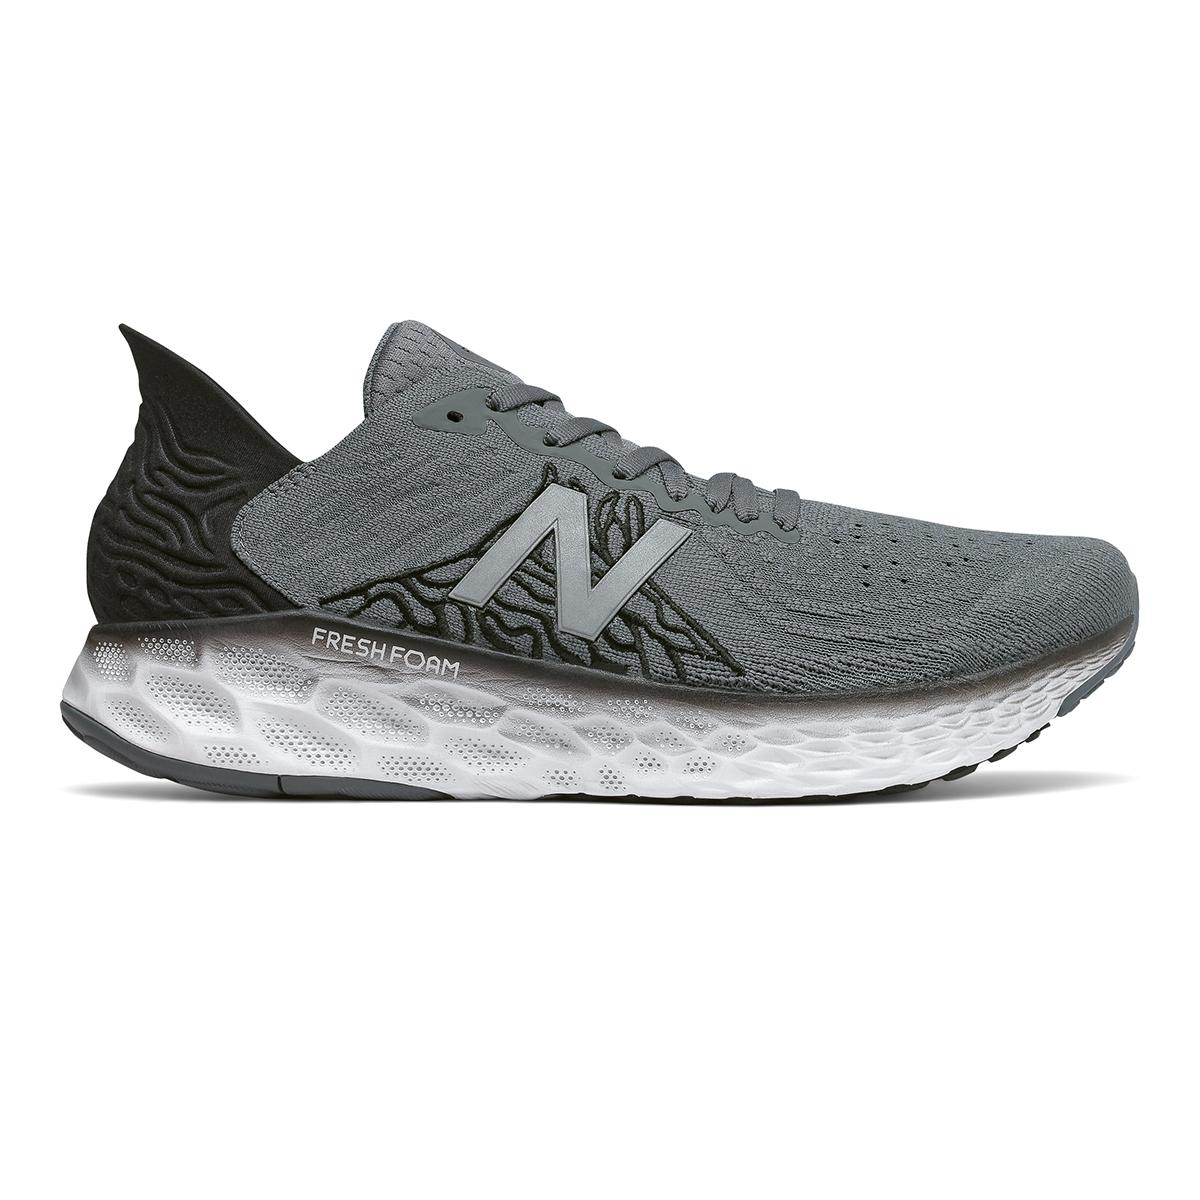 Men's New Balance Fresh Foam 1080v10 Running Shoe - Color: Lead - Size: 7 - Width: Wide, Lead, large, image 1